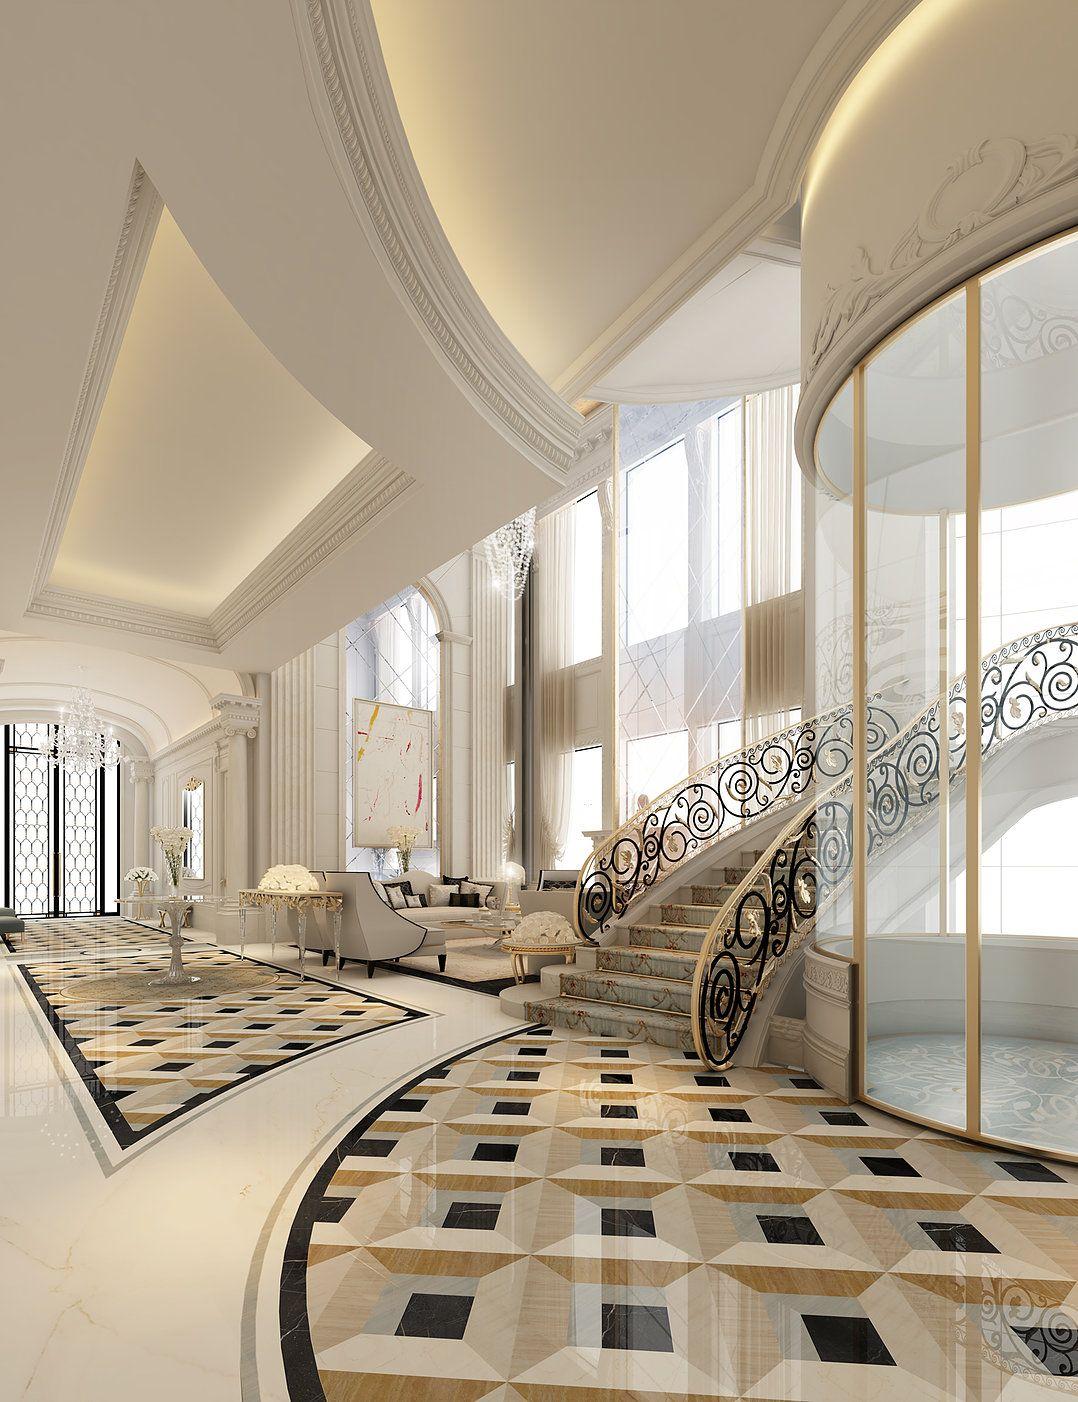 Staircase lounge design qatar doha